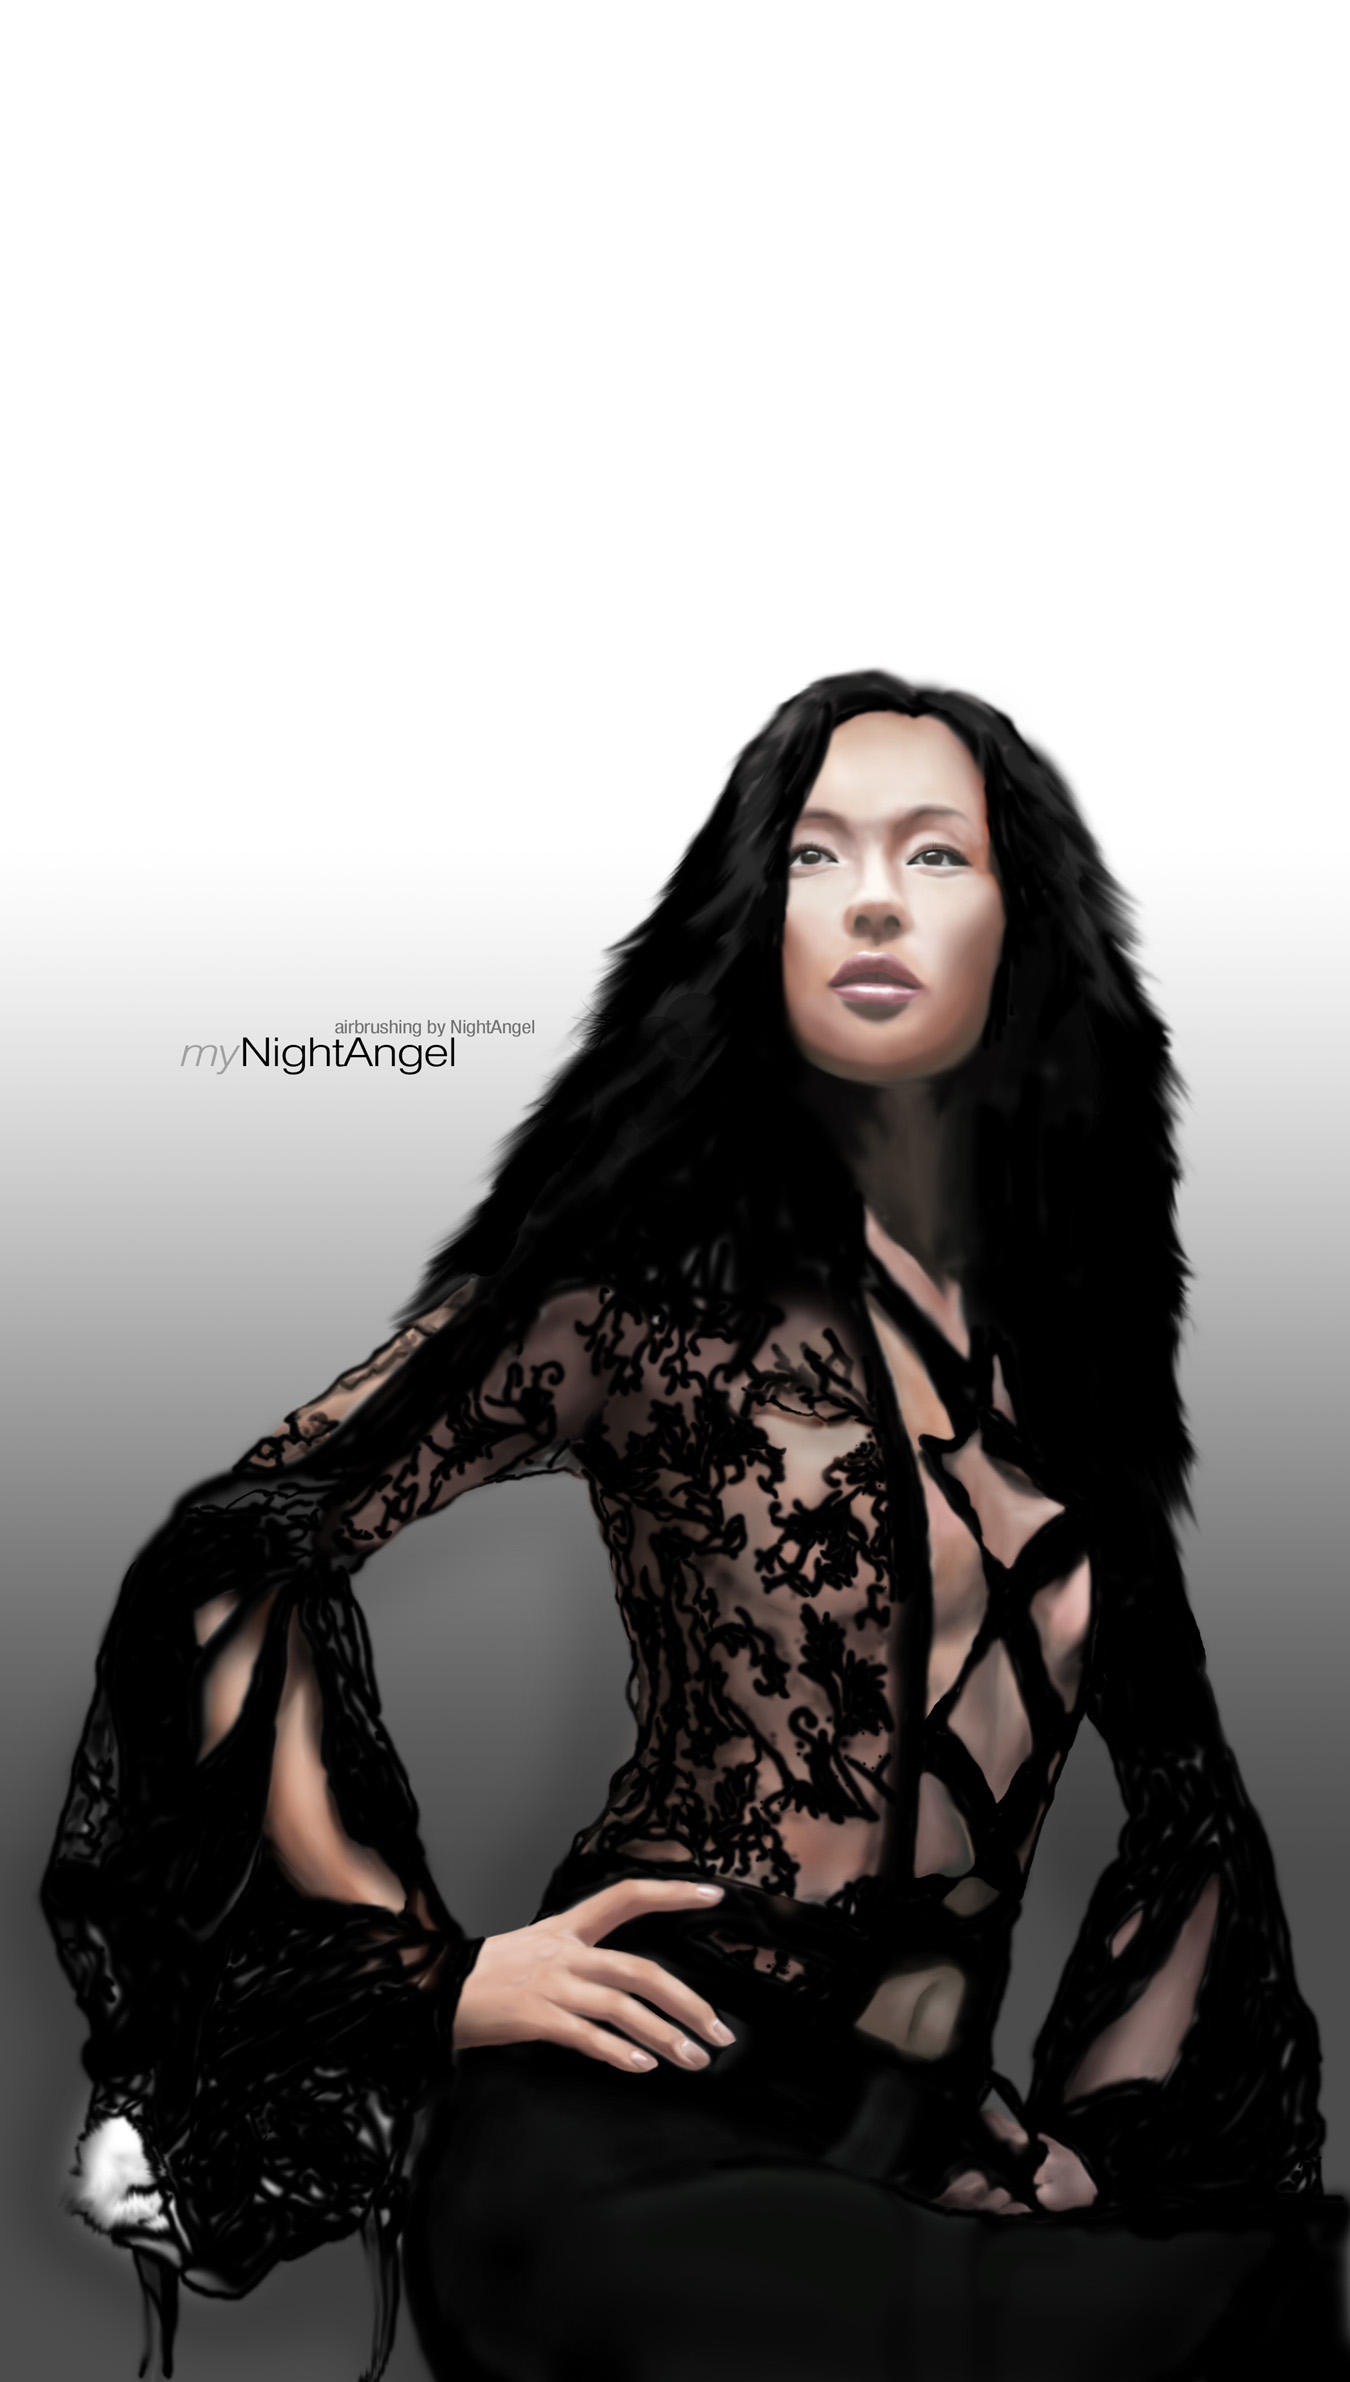 myNightAngel by niteangel